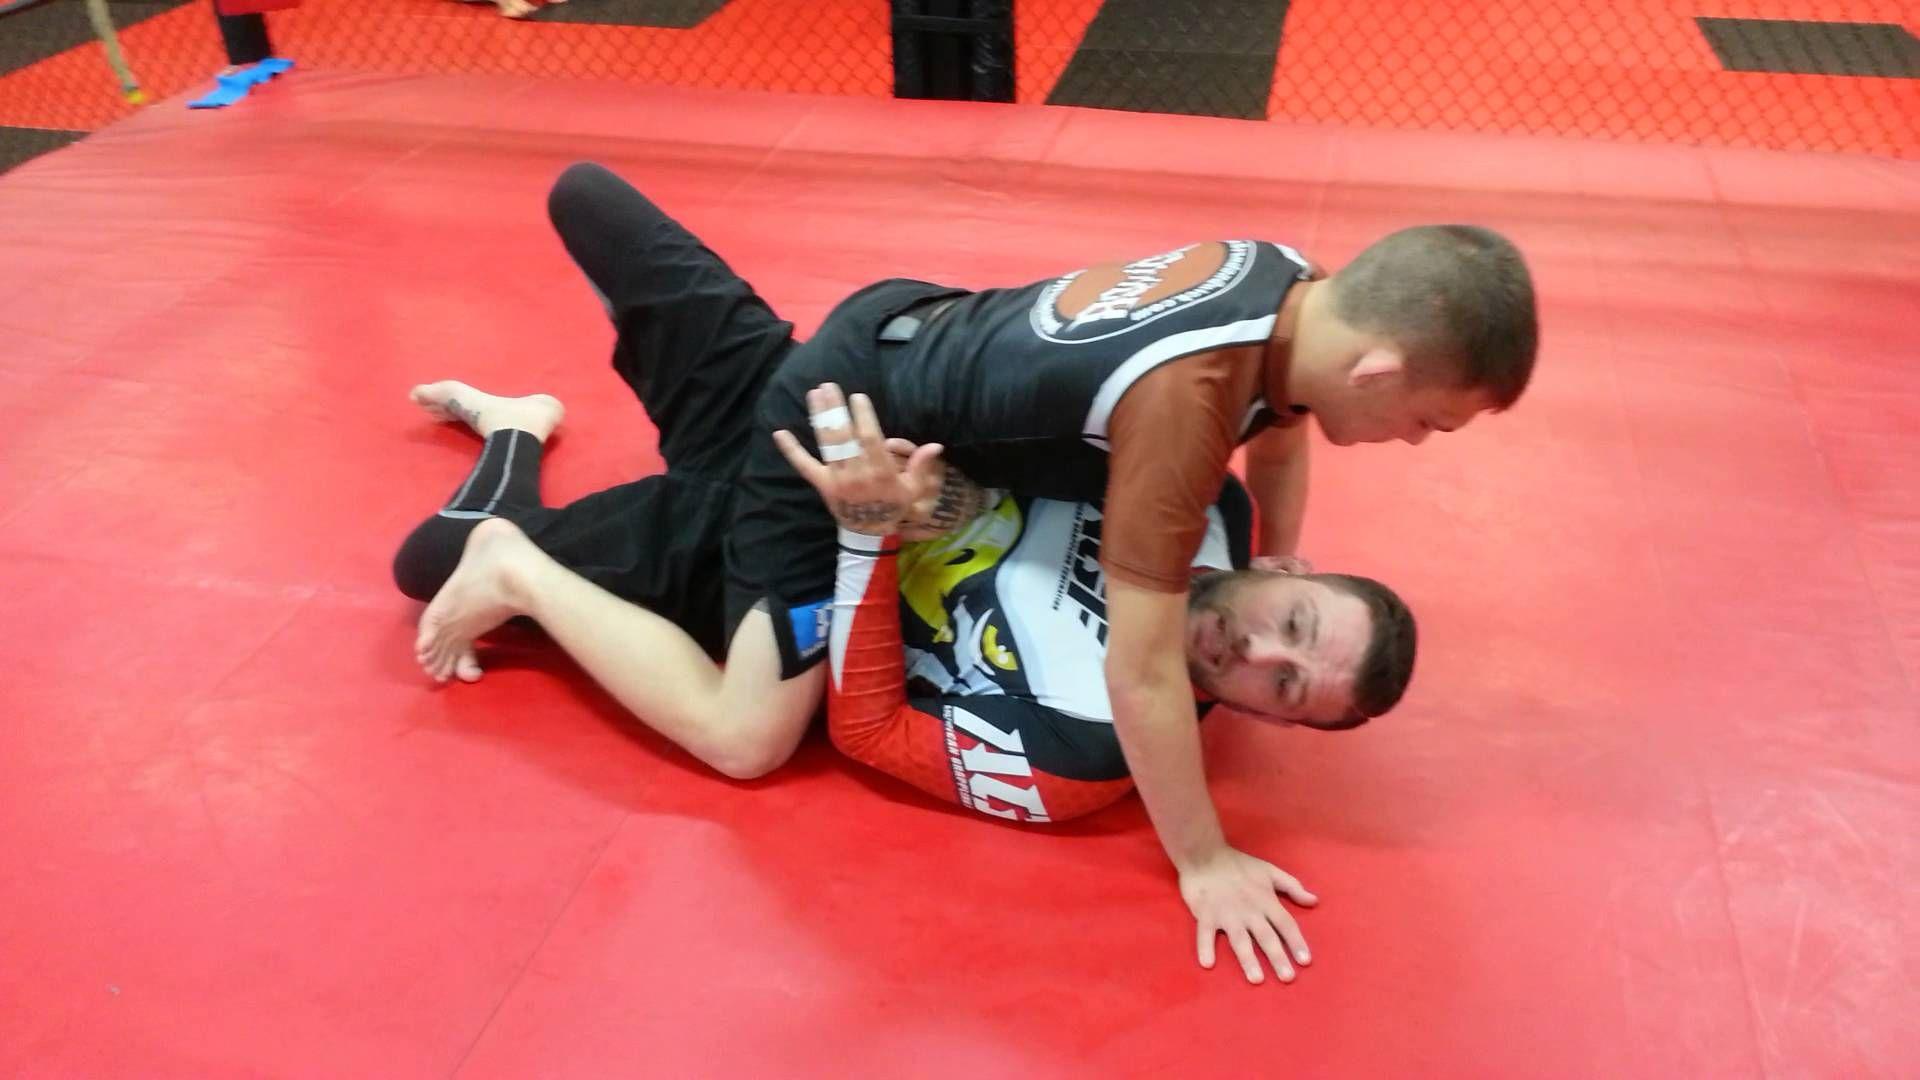 Dogfight vs mount jujitsu brazilian jiu jitsu jiu jitsu